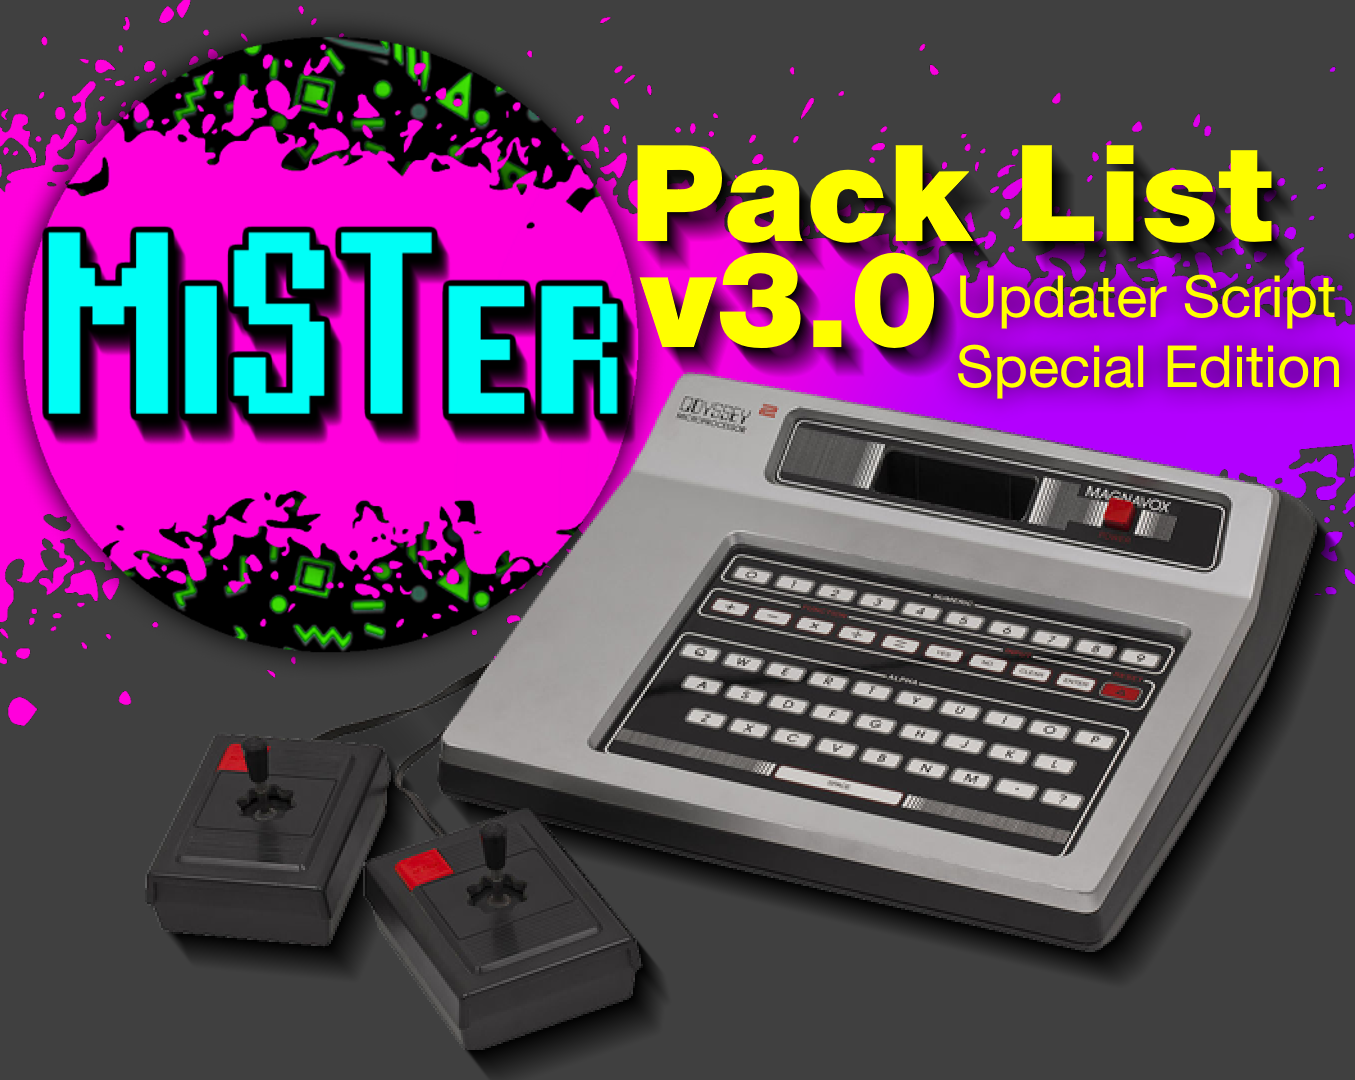 MiSTer Pack List v3.0 Released – Updater Script Special Edition